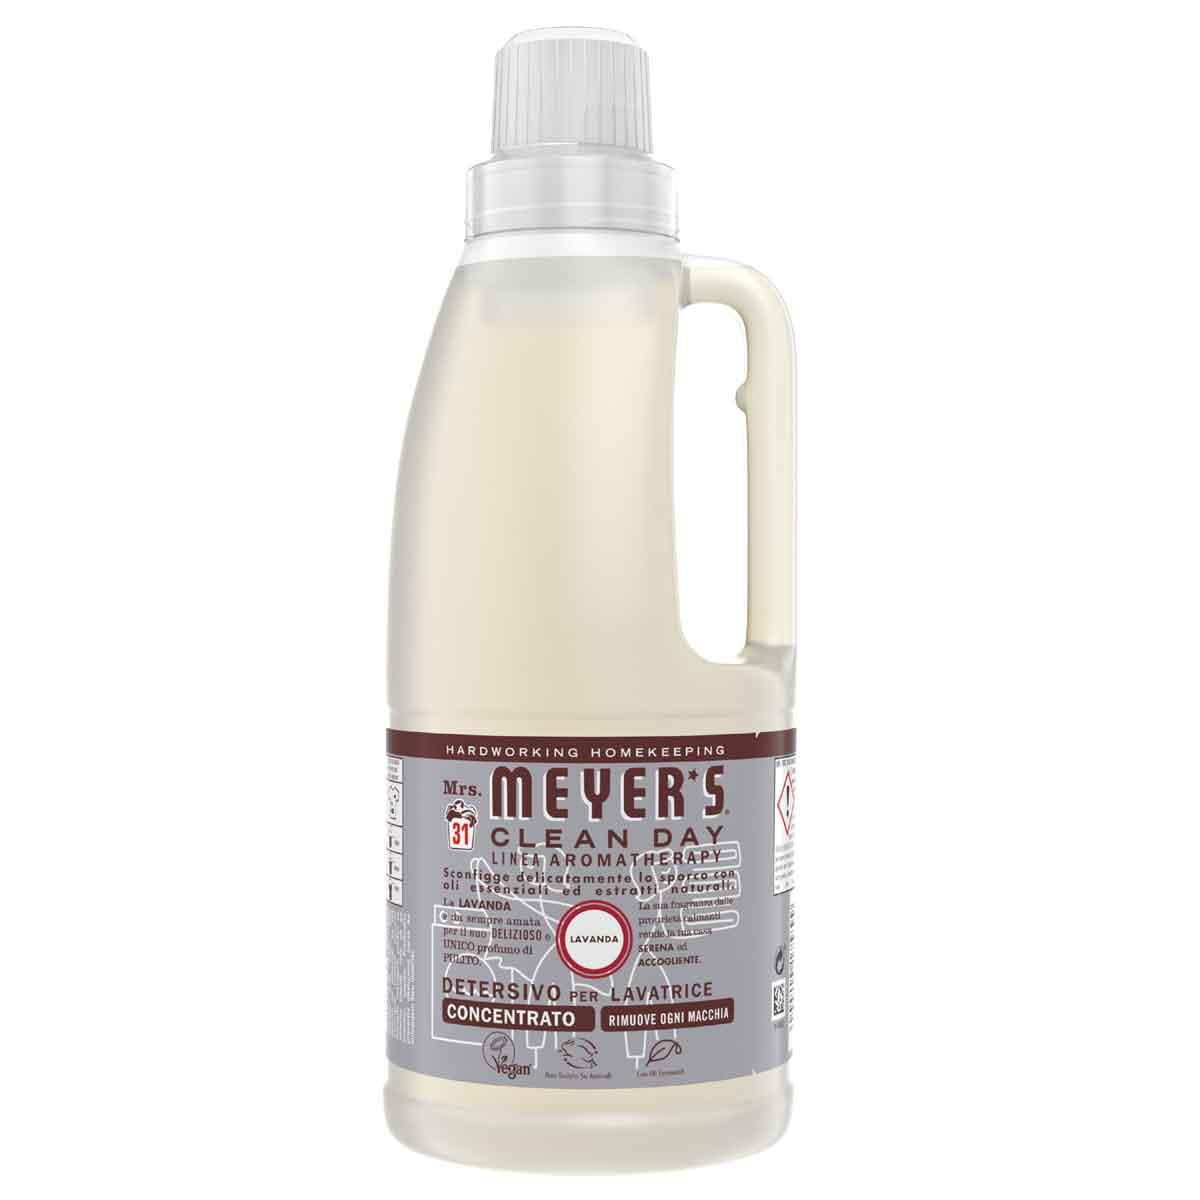 Mrs. Meyer's Detersivo Lavatrice Lavanda